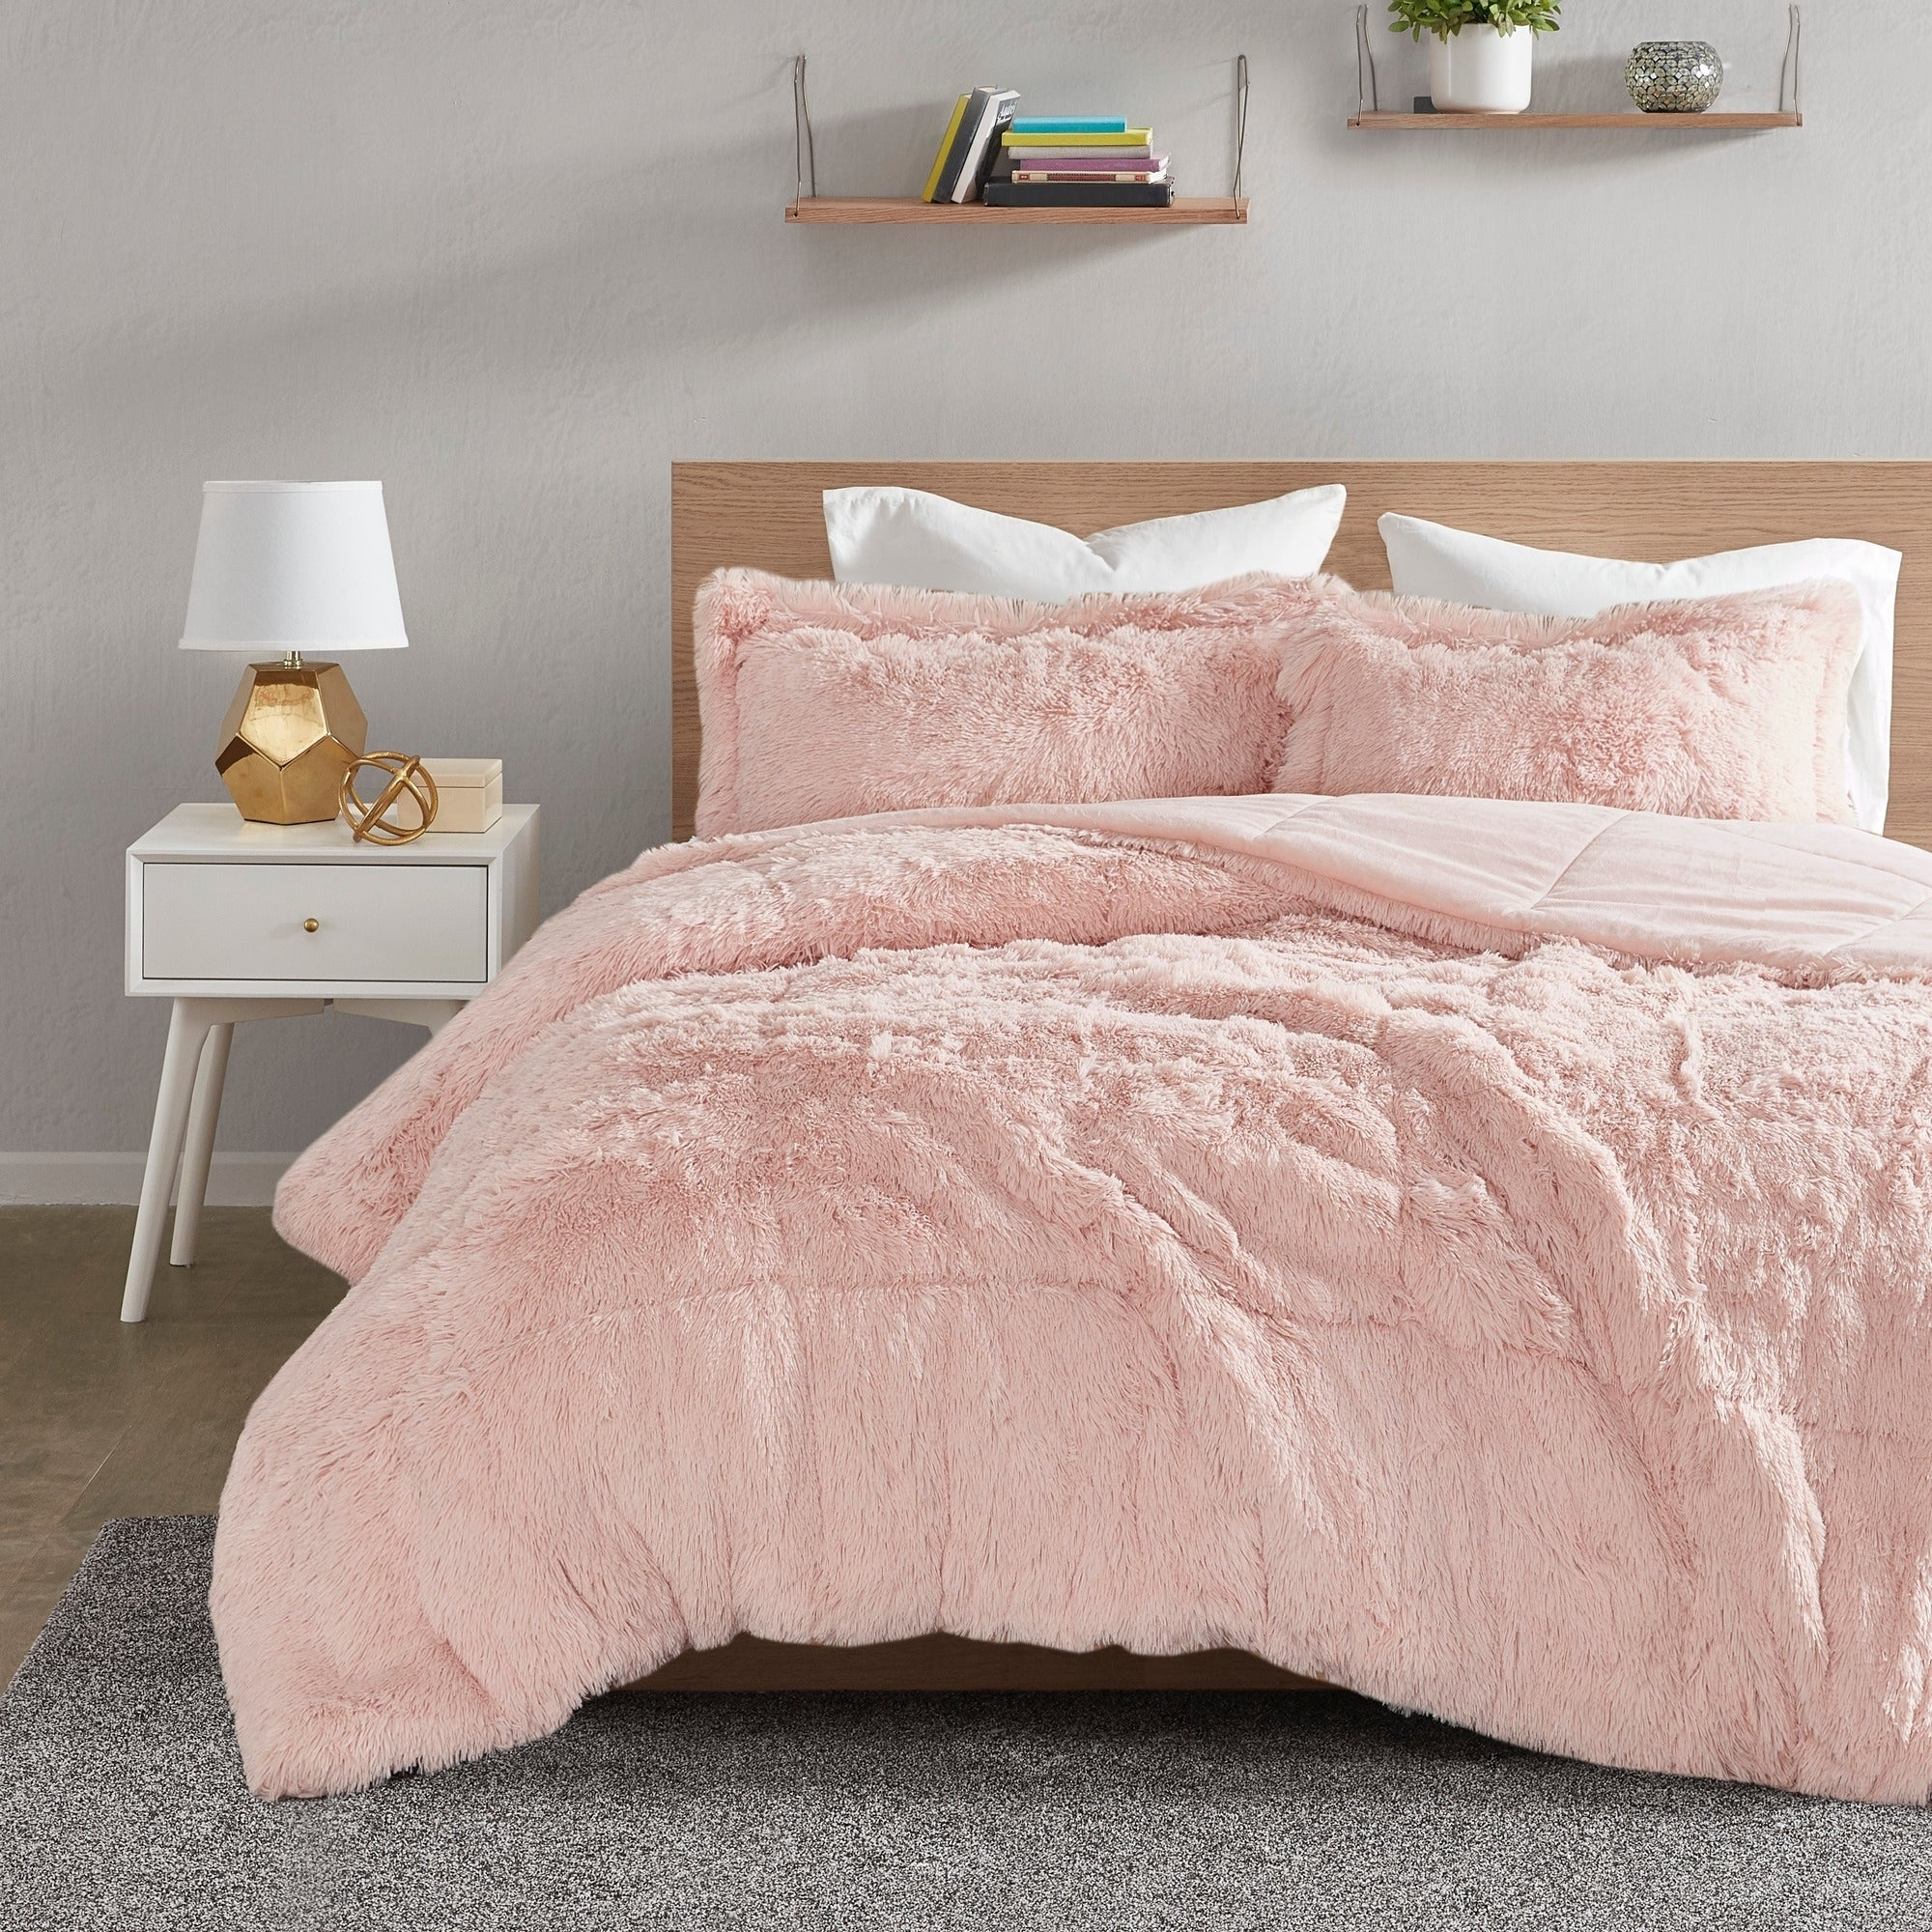 Shop Intelligent Design Leena Shaggy Faux Fur Comforter Set On